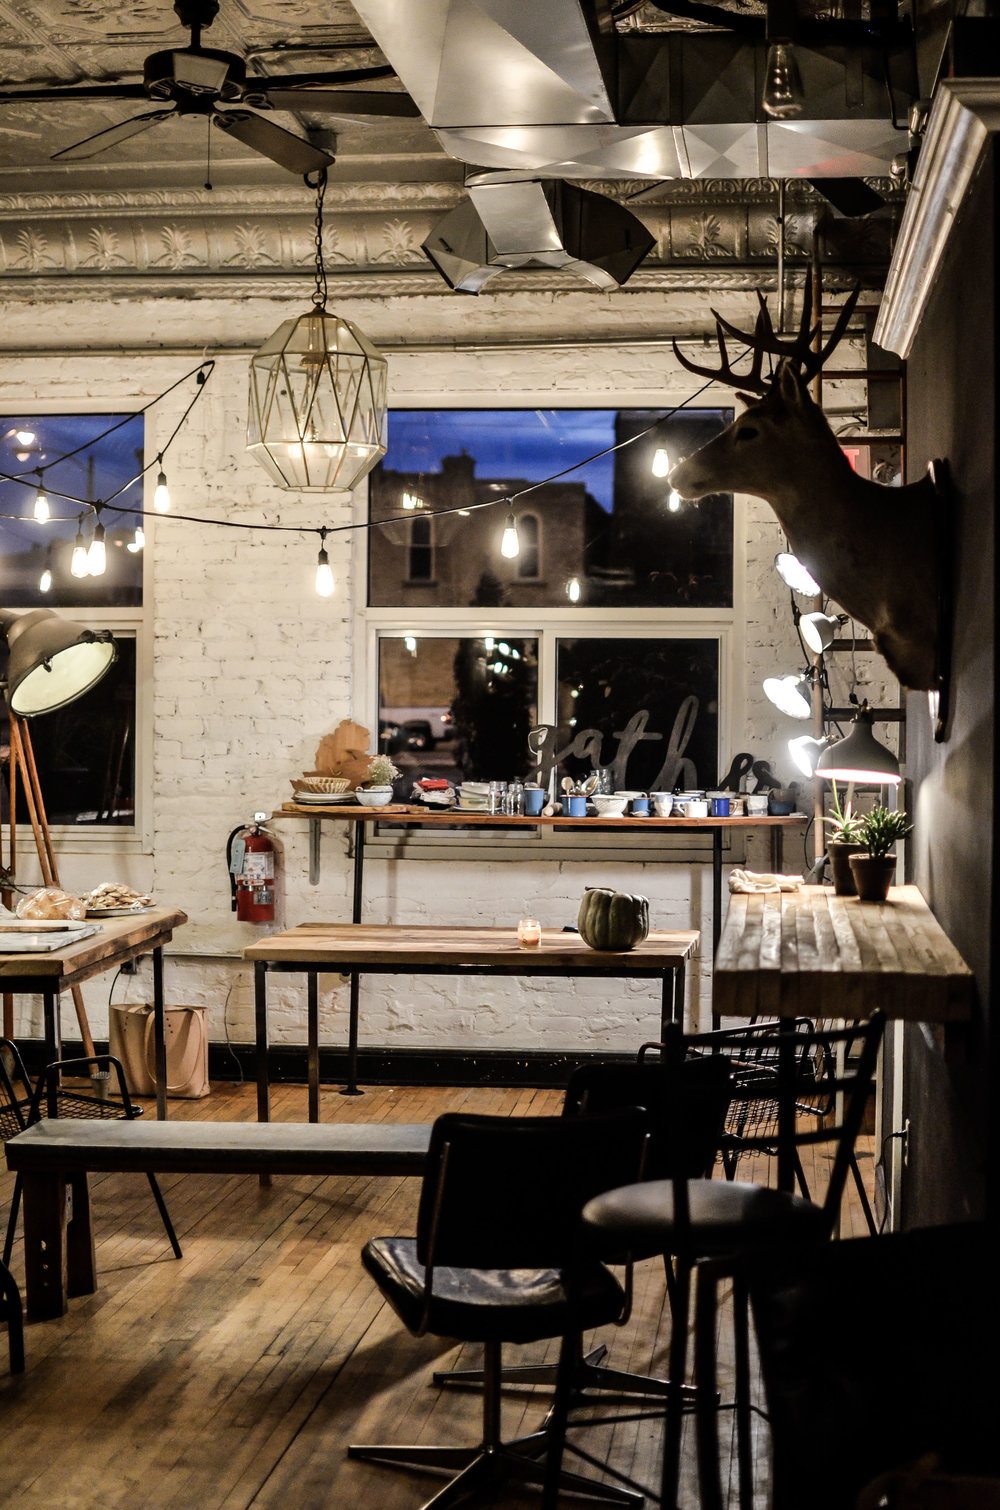 Wendling_Boyd_Harless_Hugh_Gathering_Food_Styling_Class-2.jpg